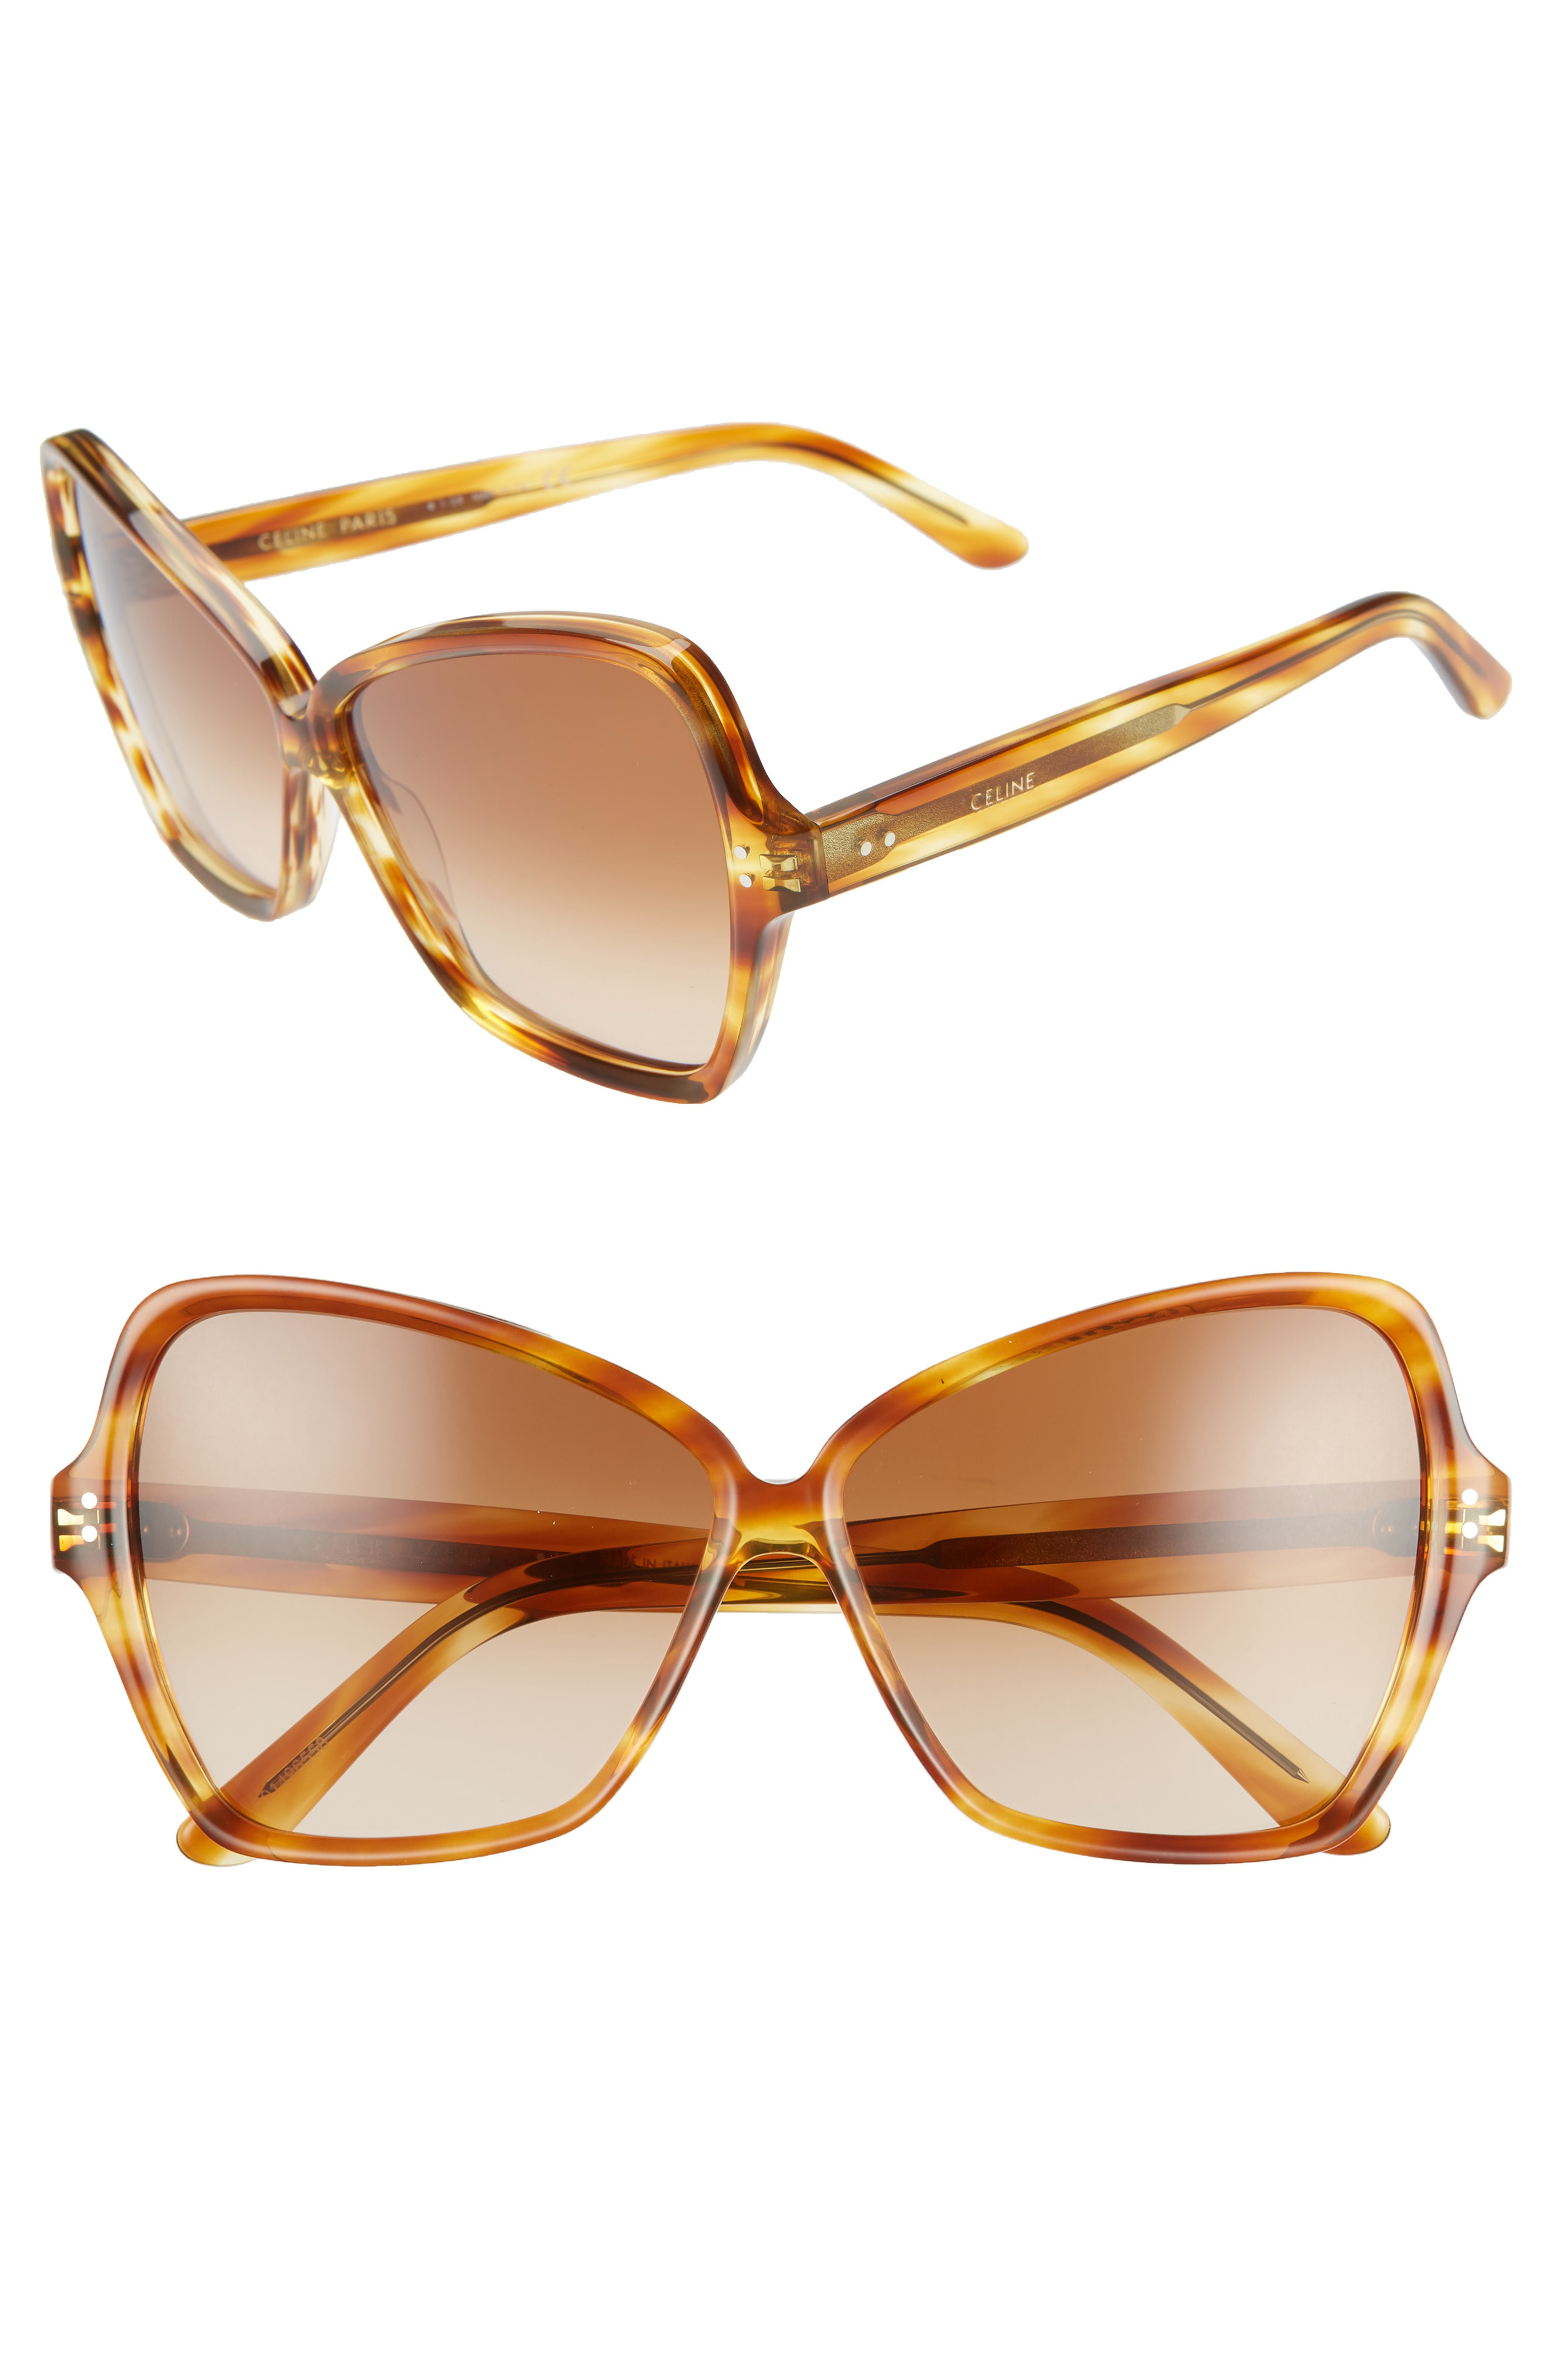 9b1198b884d1 Celine 64Mm Oversize Butterfly Sunglasses - Honey Flamed Havana  Brown